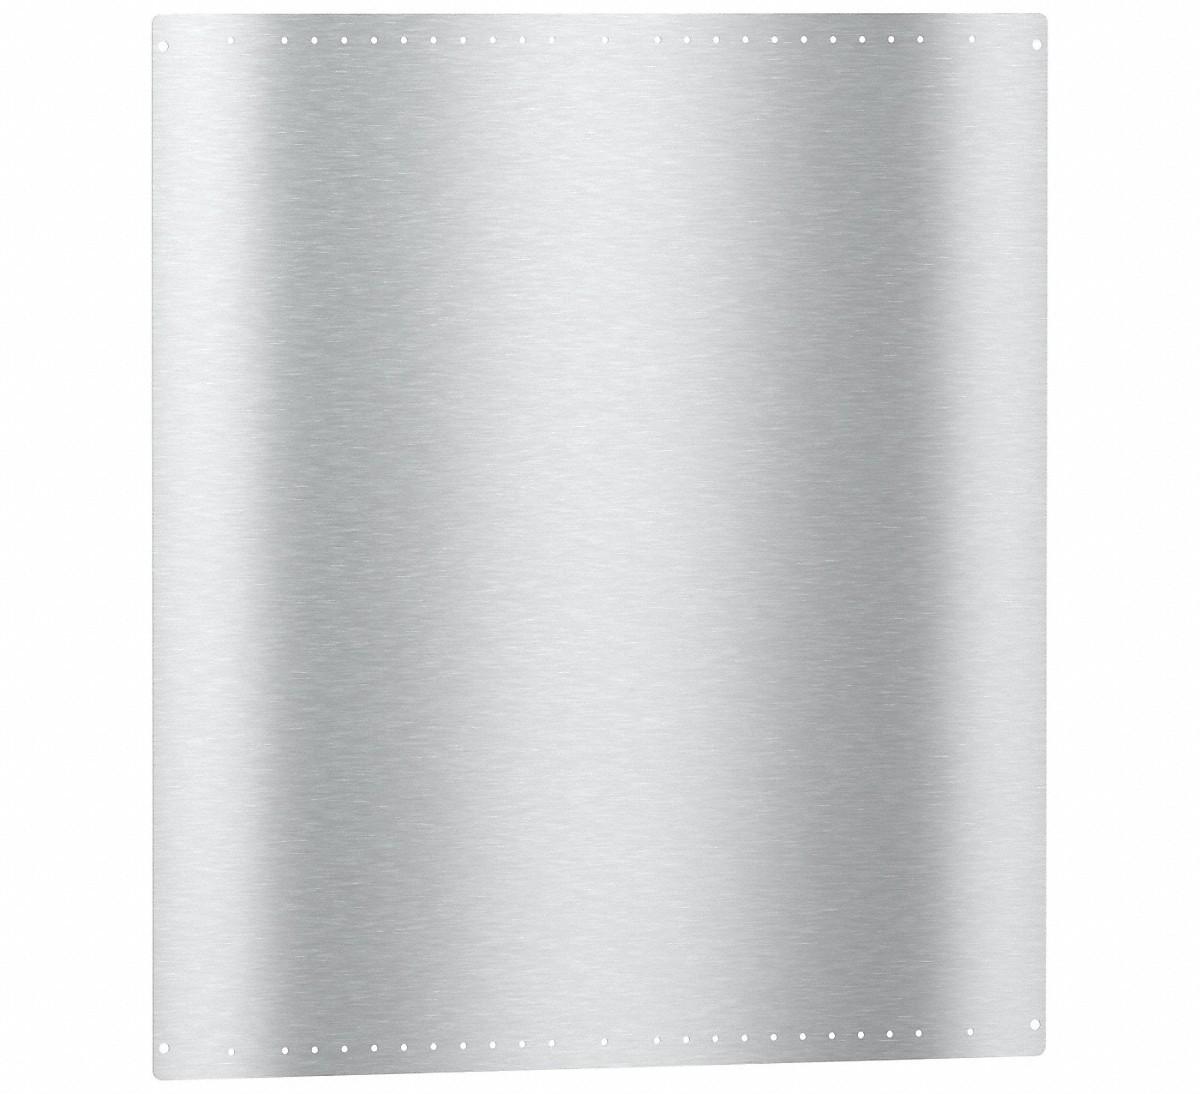 - Miele RBS36 36 Inch Stainless Steel Backsplash